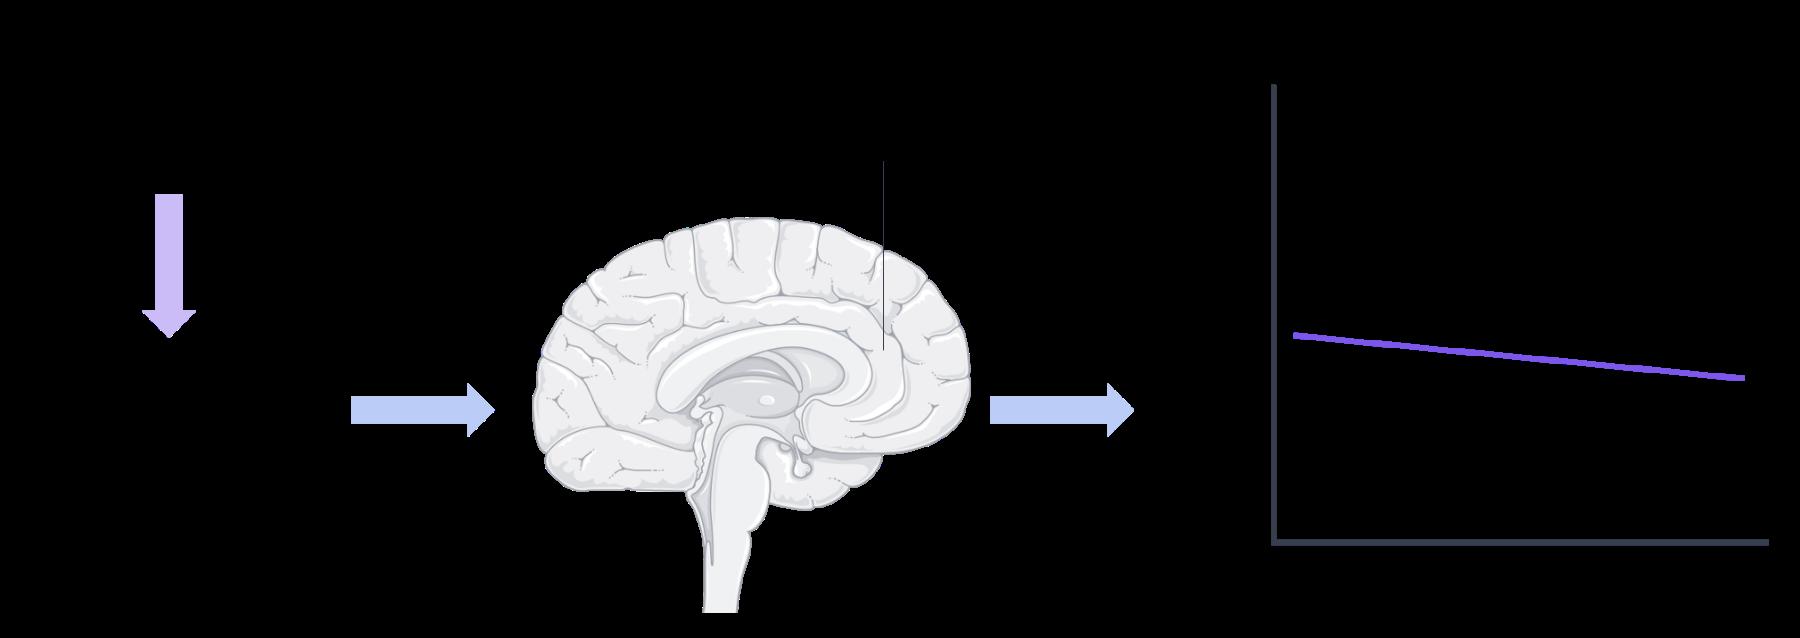 Brain, S  ervier Medical Art, image by BrainPost, CC BY-SA 3.0